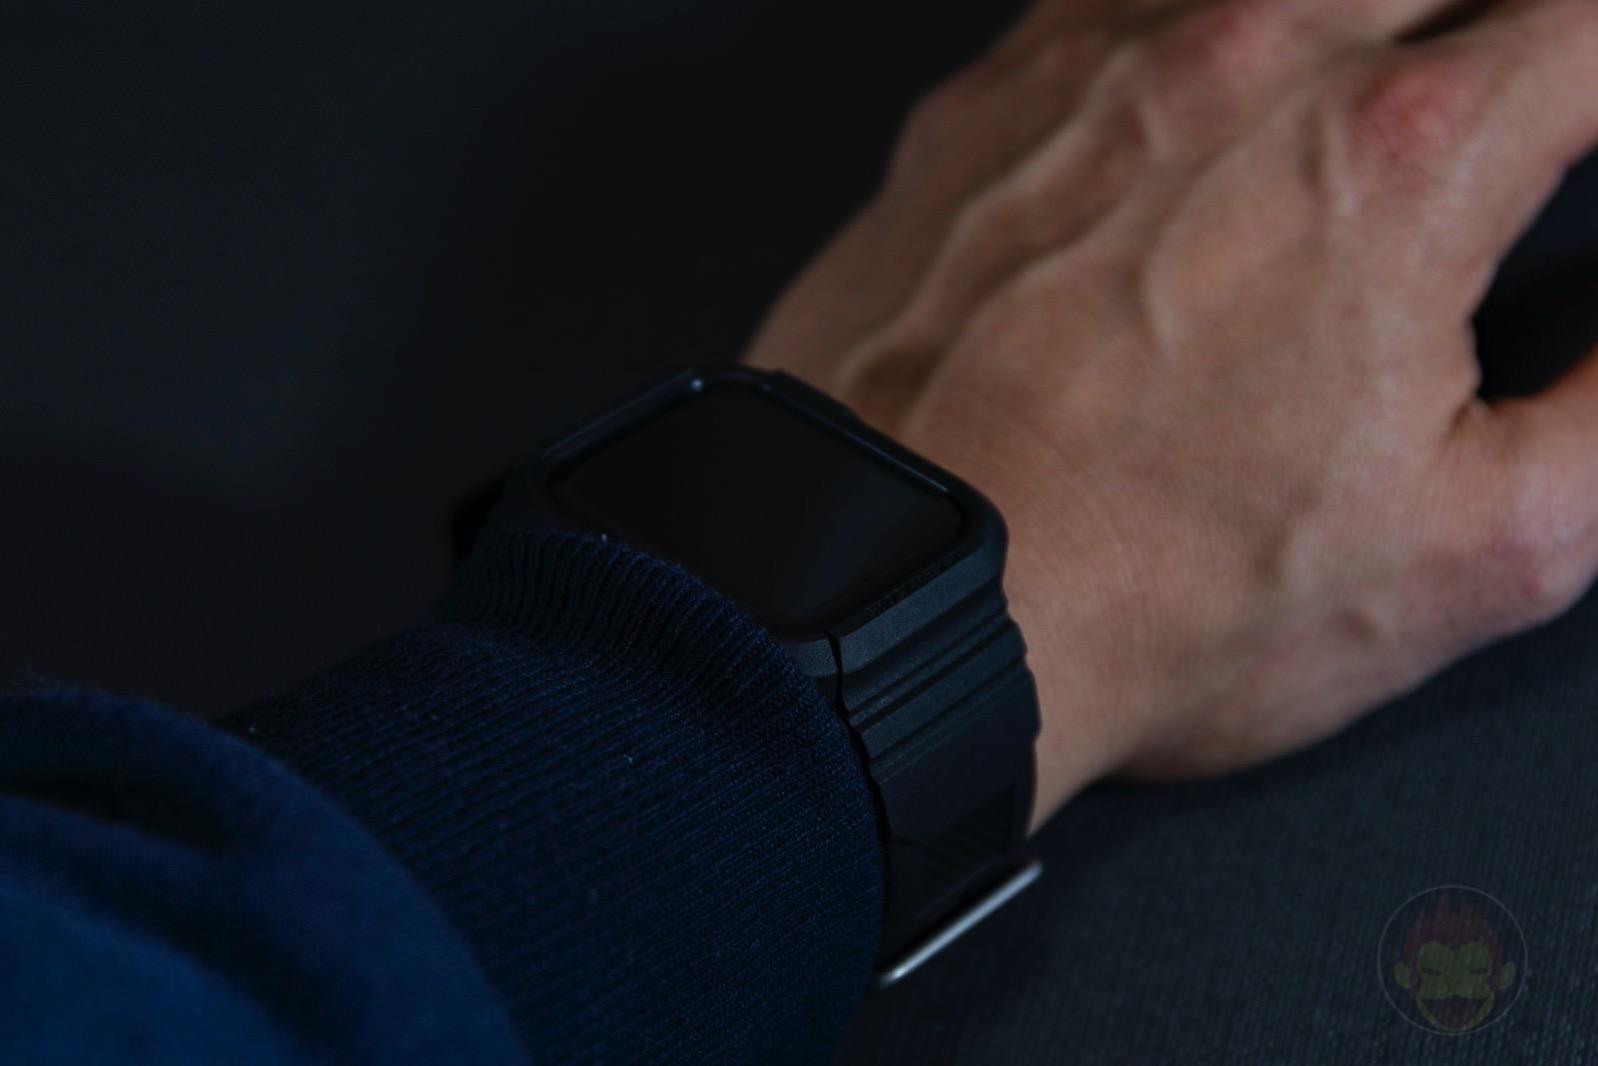 Spigen-Rugged-Armor-Pro-Apple-Watch-Band-and-case-13.jpg